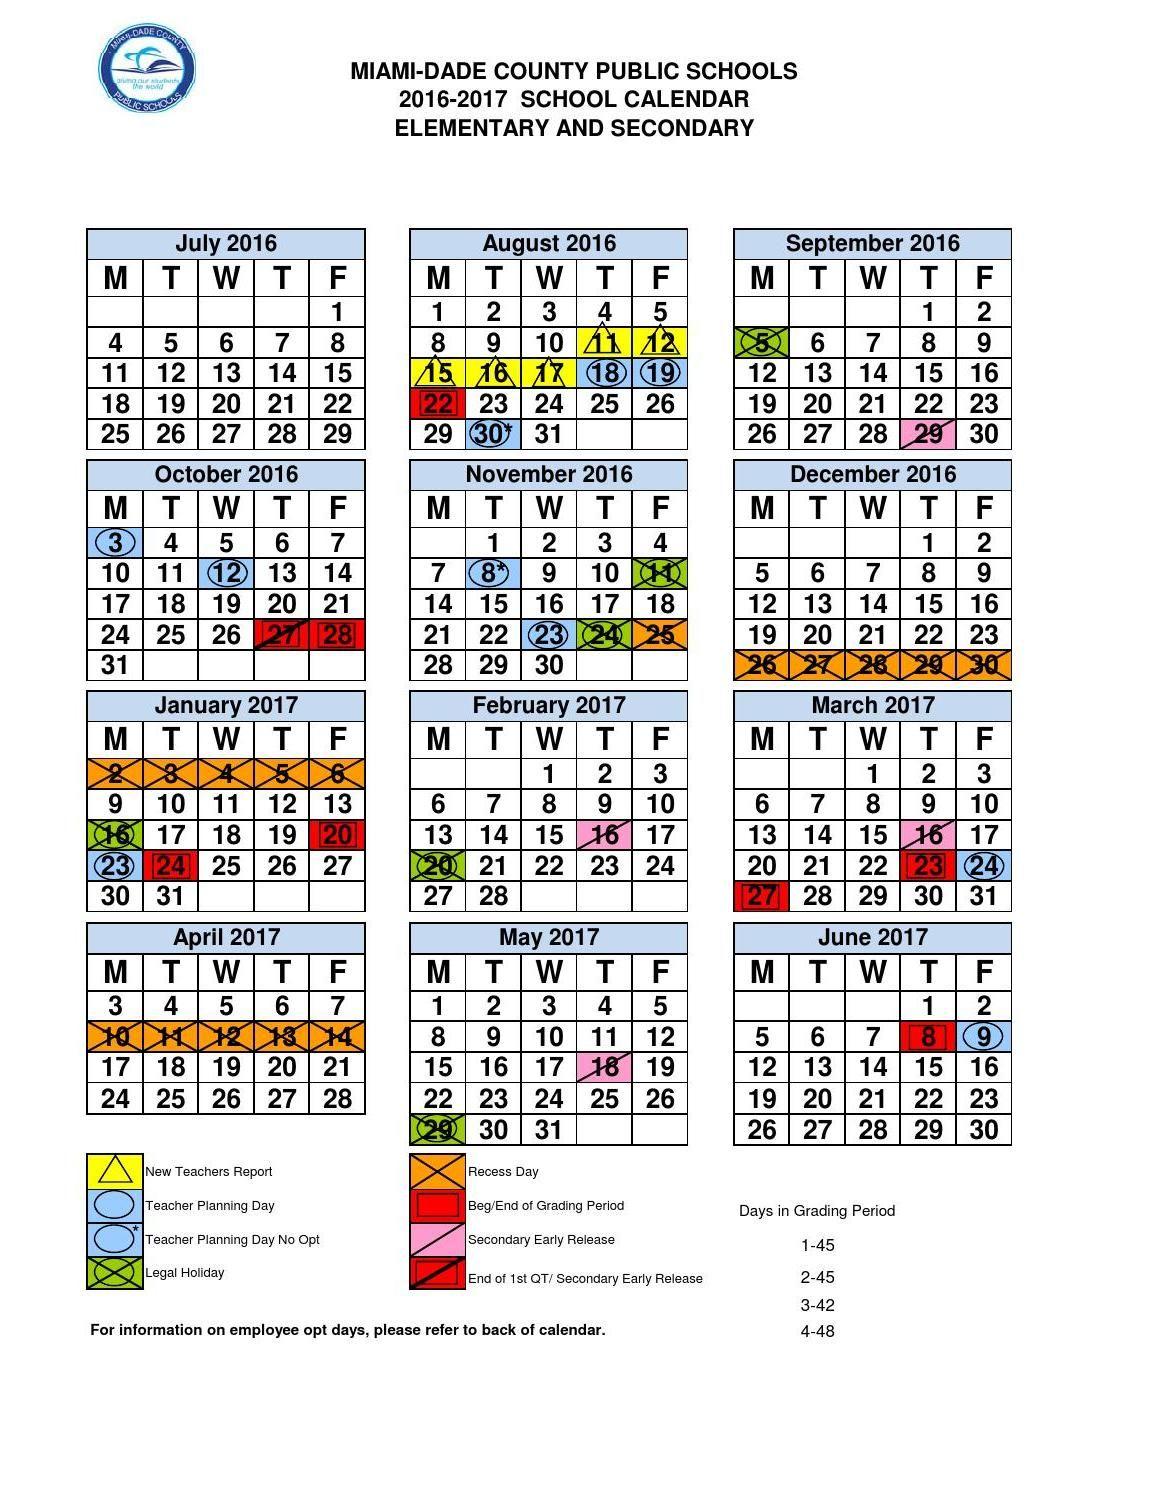 Clippedonissuu From Mdc School Calendar 2016-17 | School